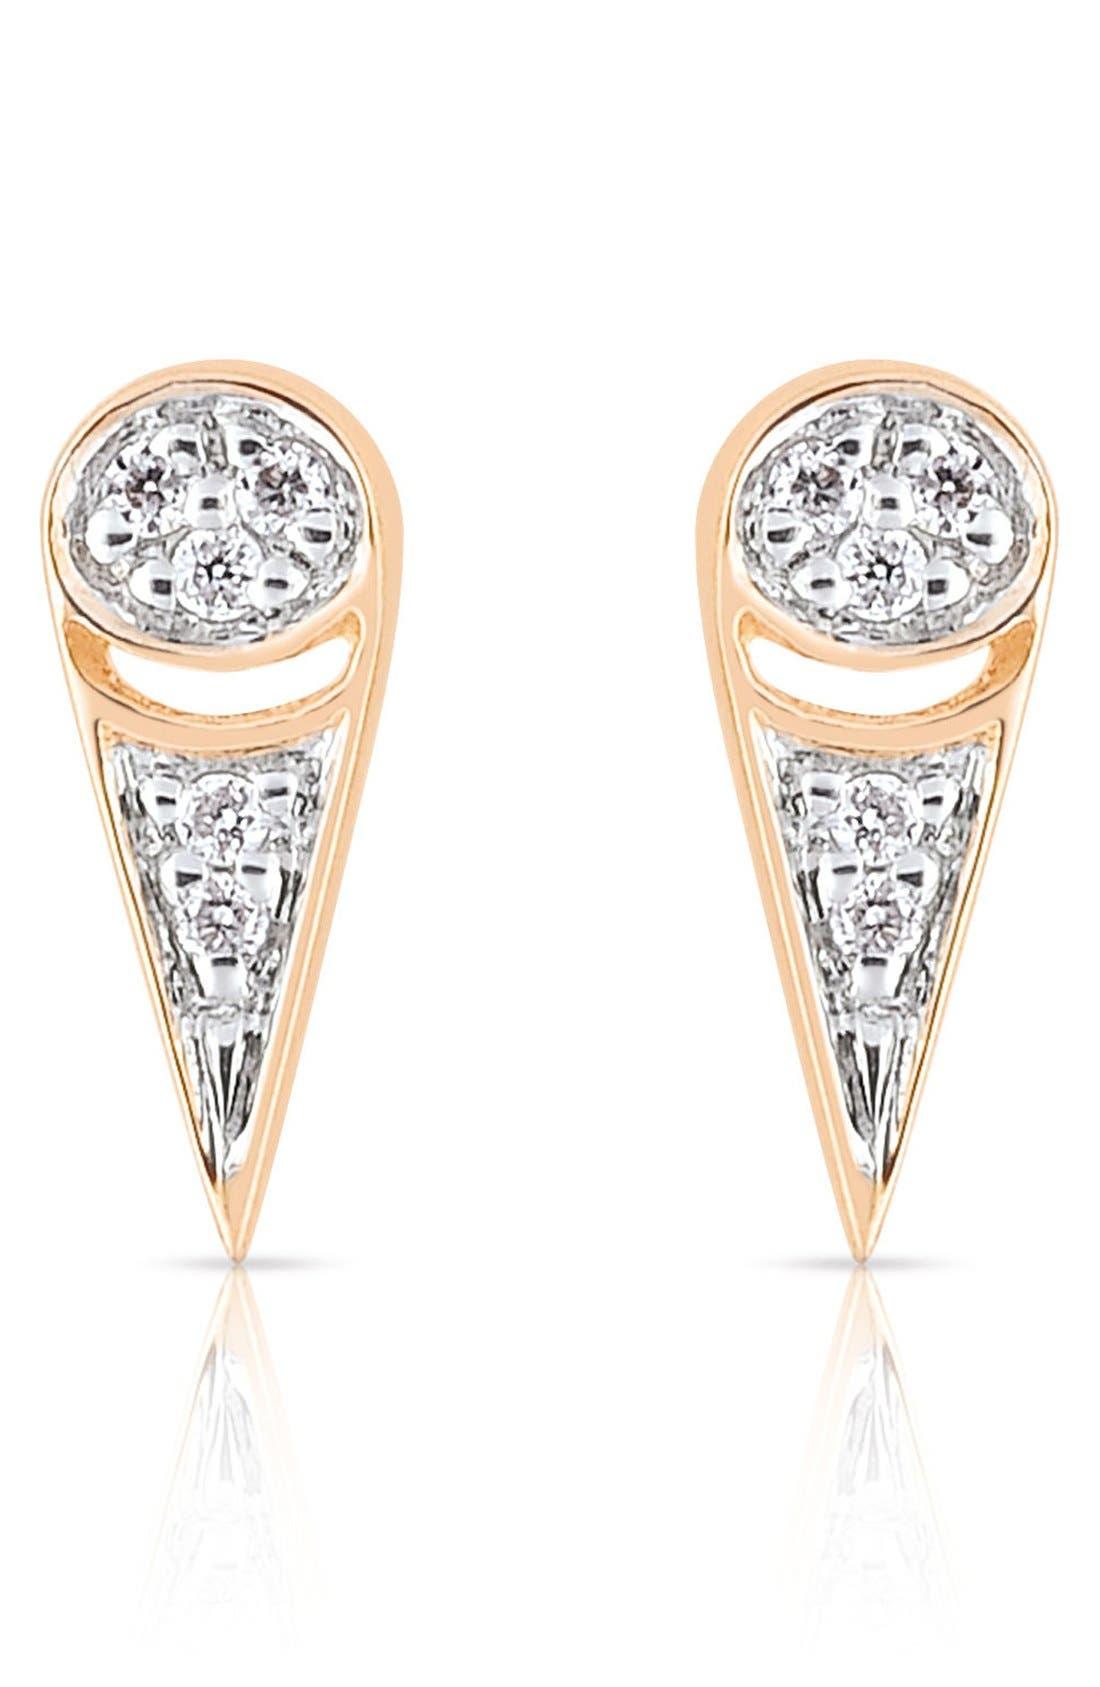 Alternate Image 1 Selected - ginette ny 'Mrs. Joe' Diamond Stud Earrings